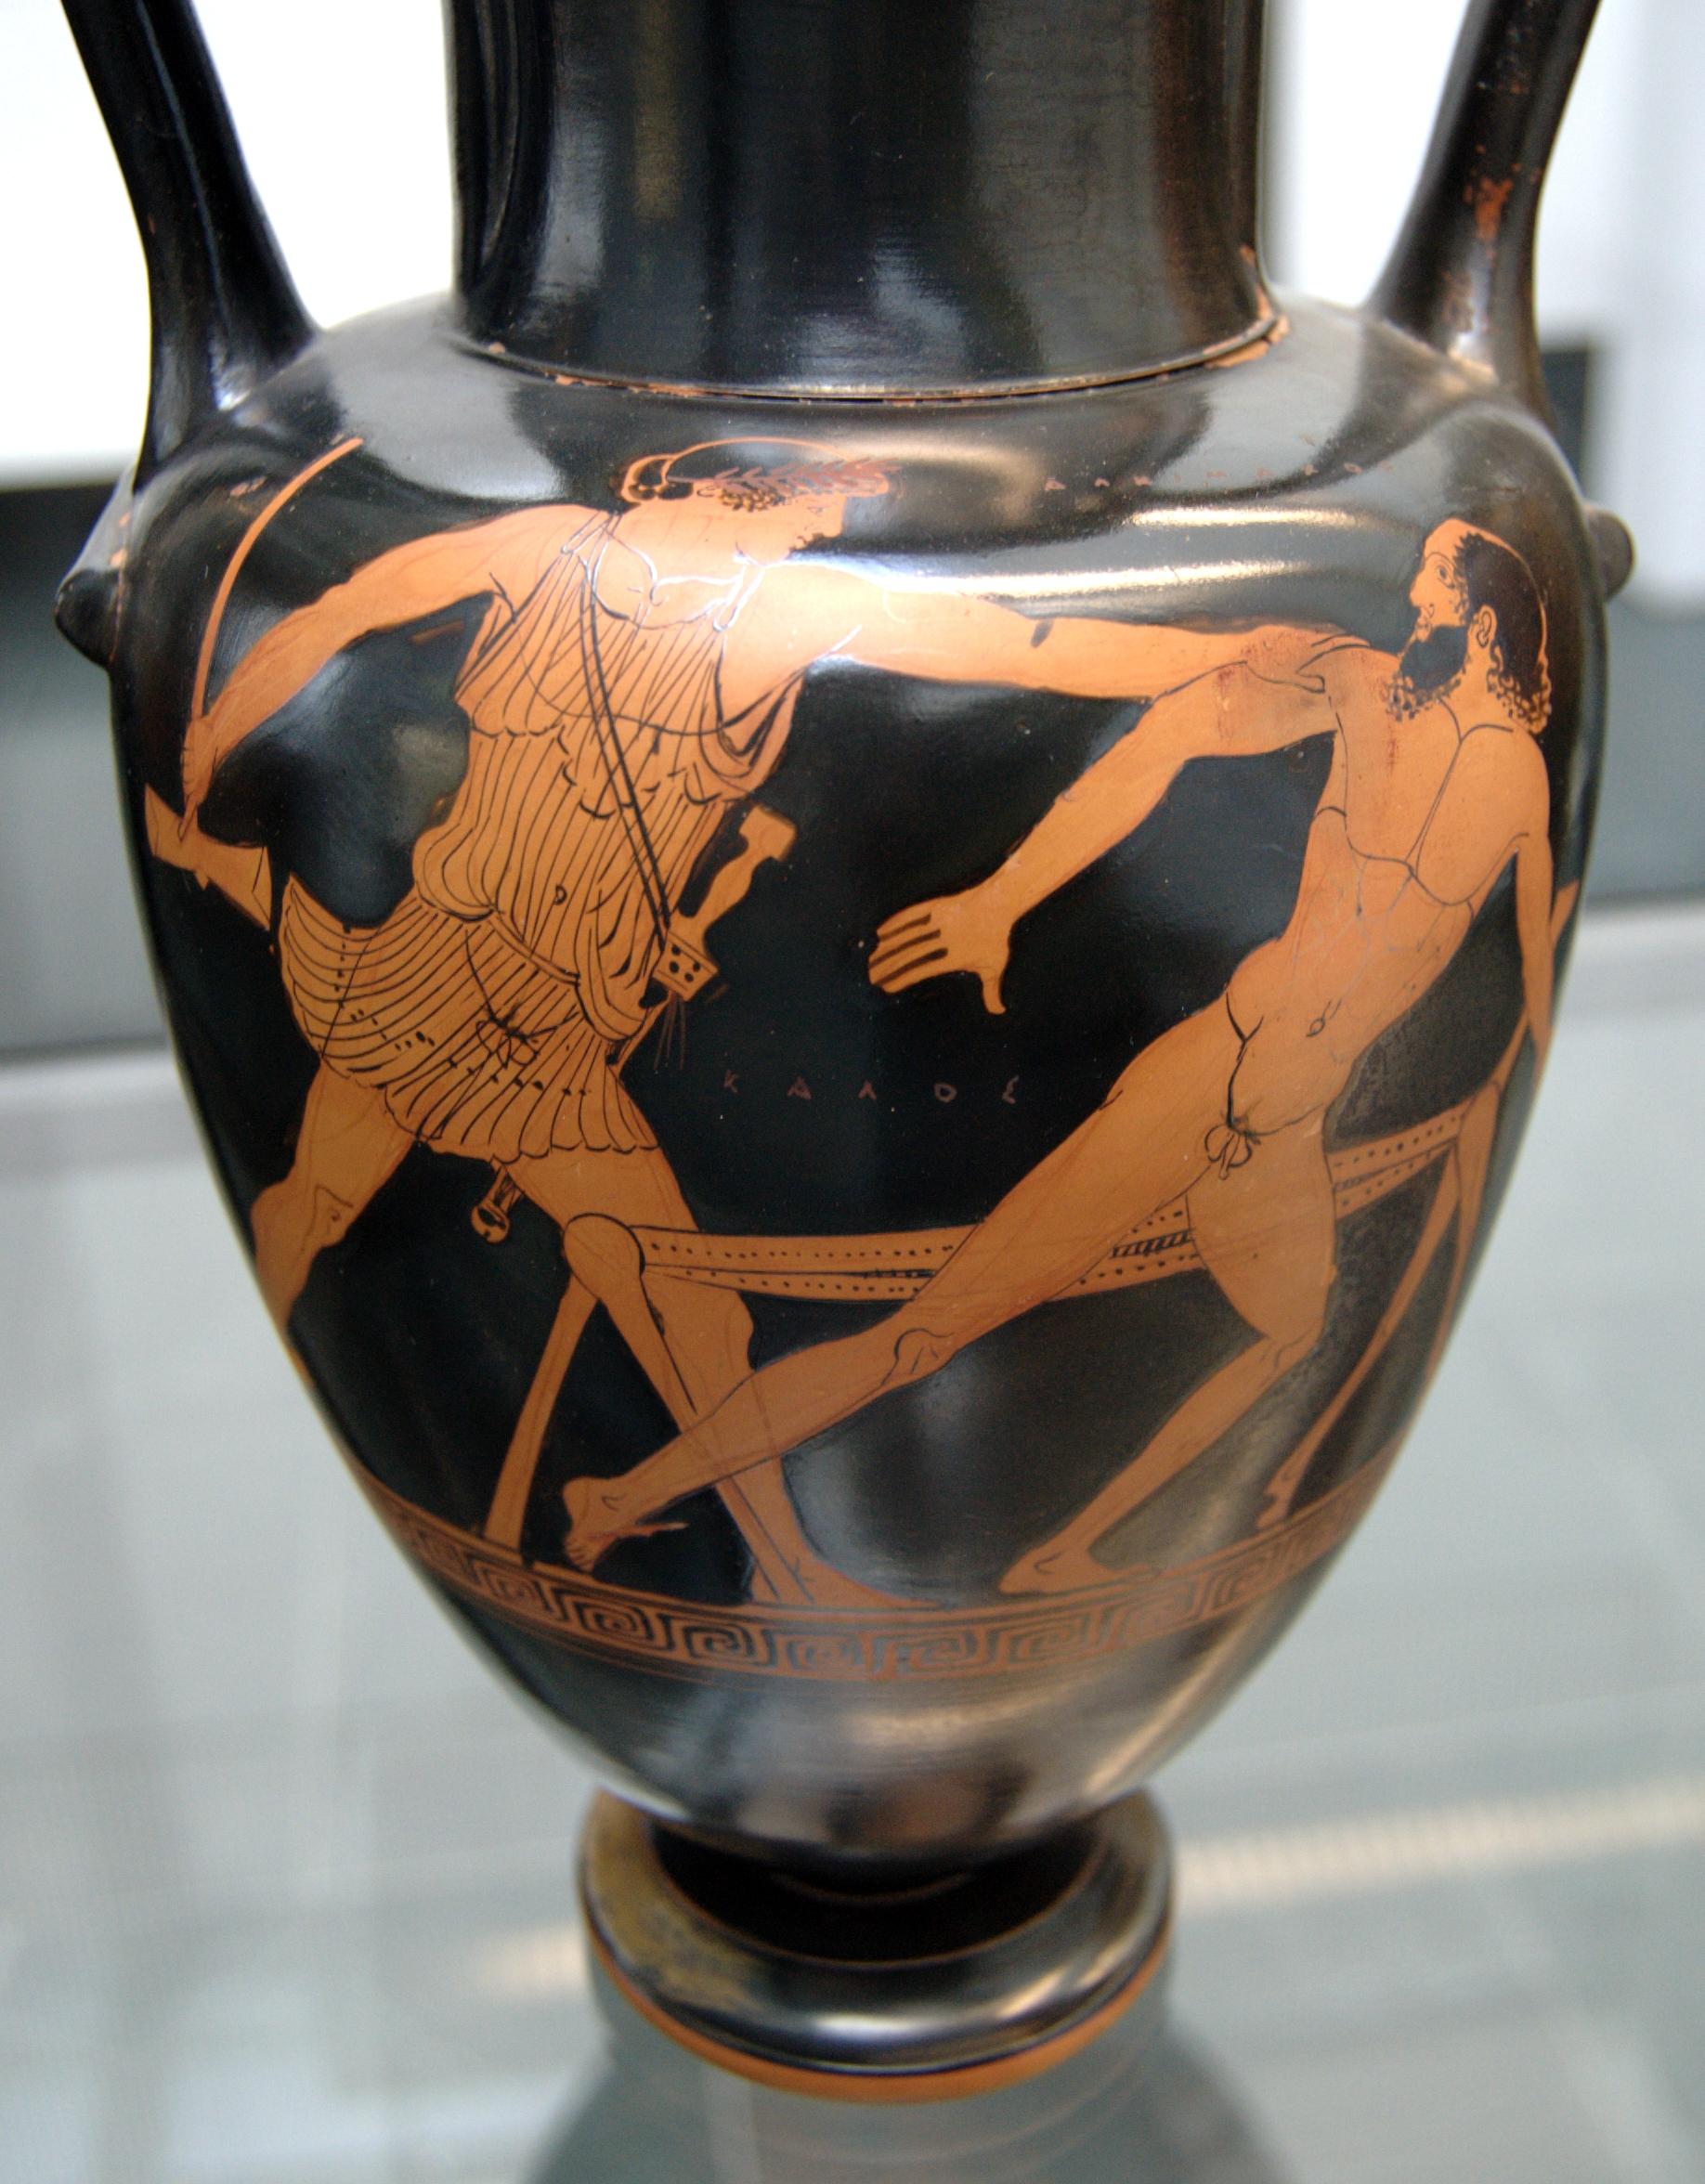 http://upload.wikimedia.org/wikipedia/commons/1/1f/Theseus_Prokroustes_Staatliche_Antikensammlungen_2325.jpg